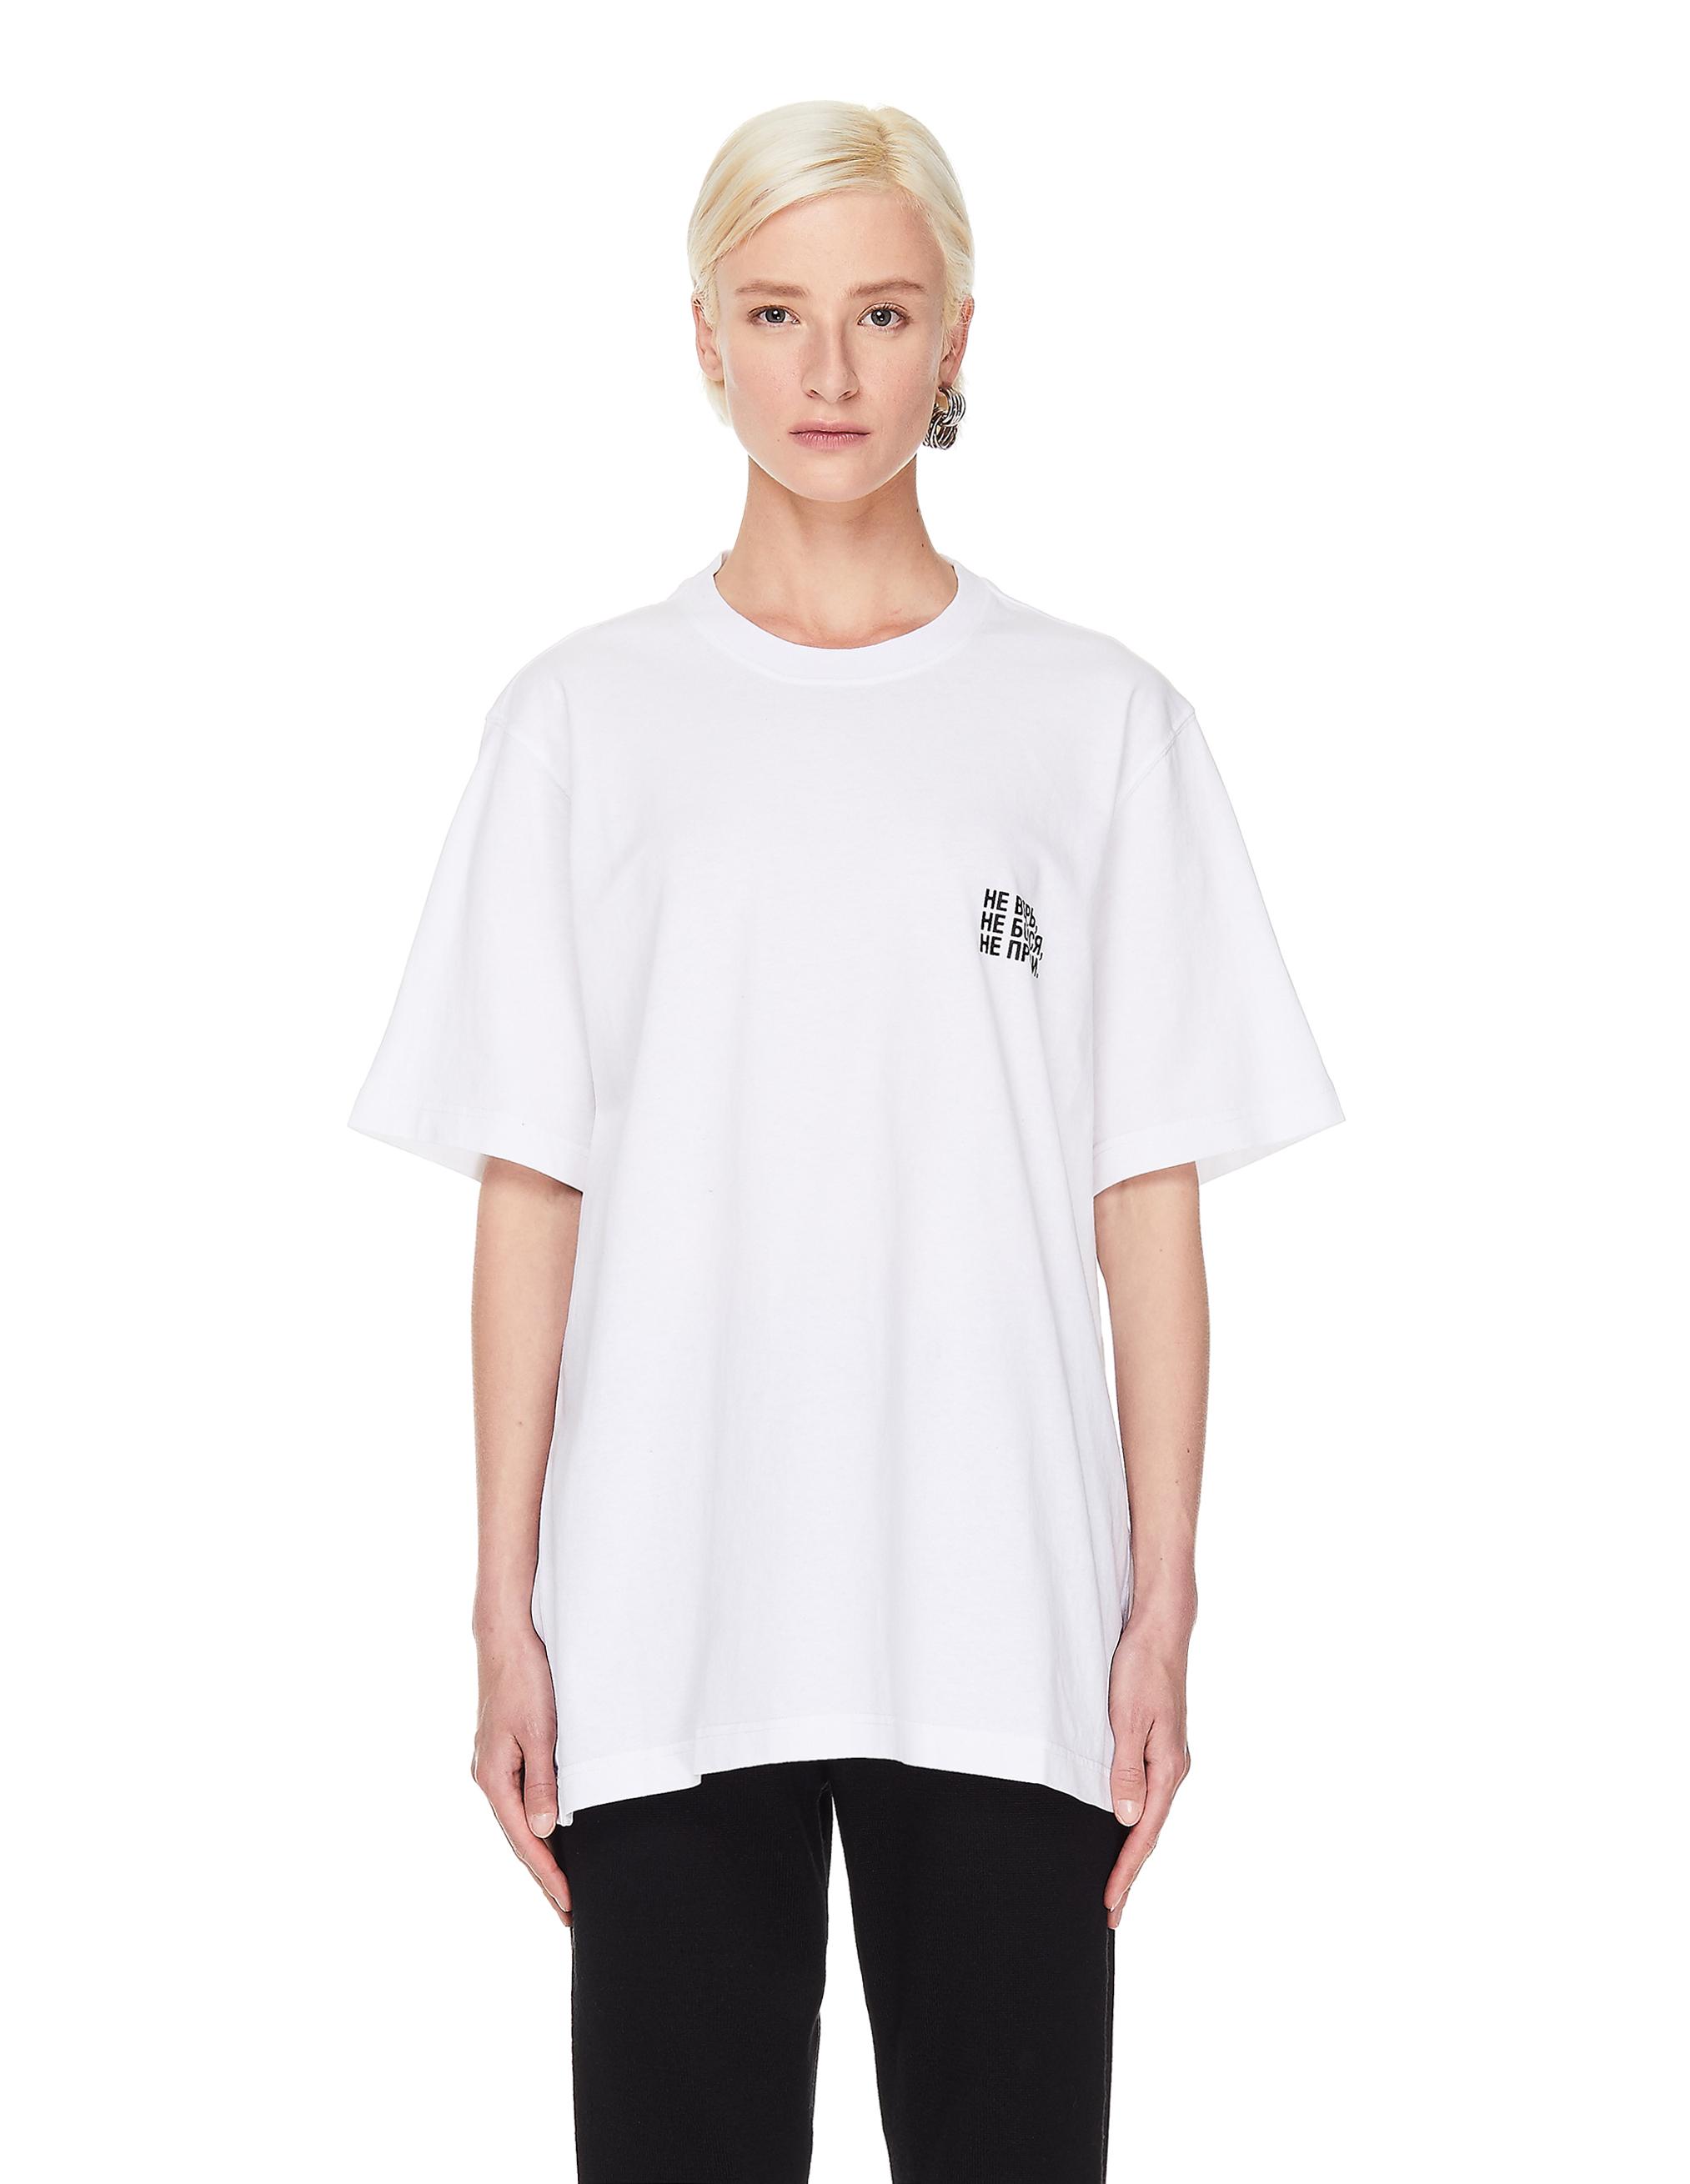 Vetements White T-shirt With Cyrillic Alphabet